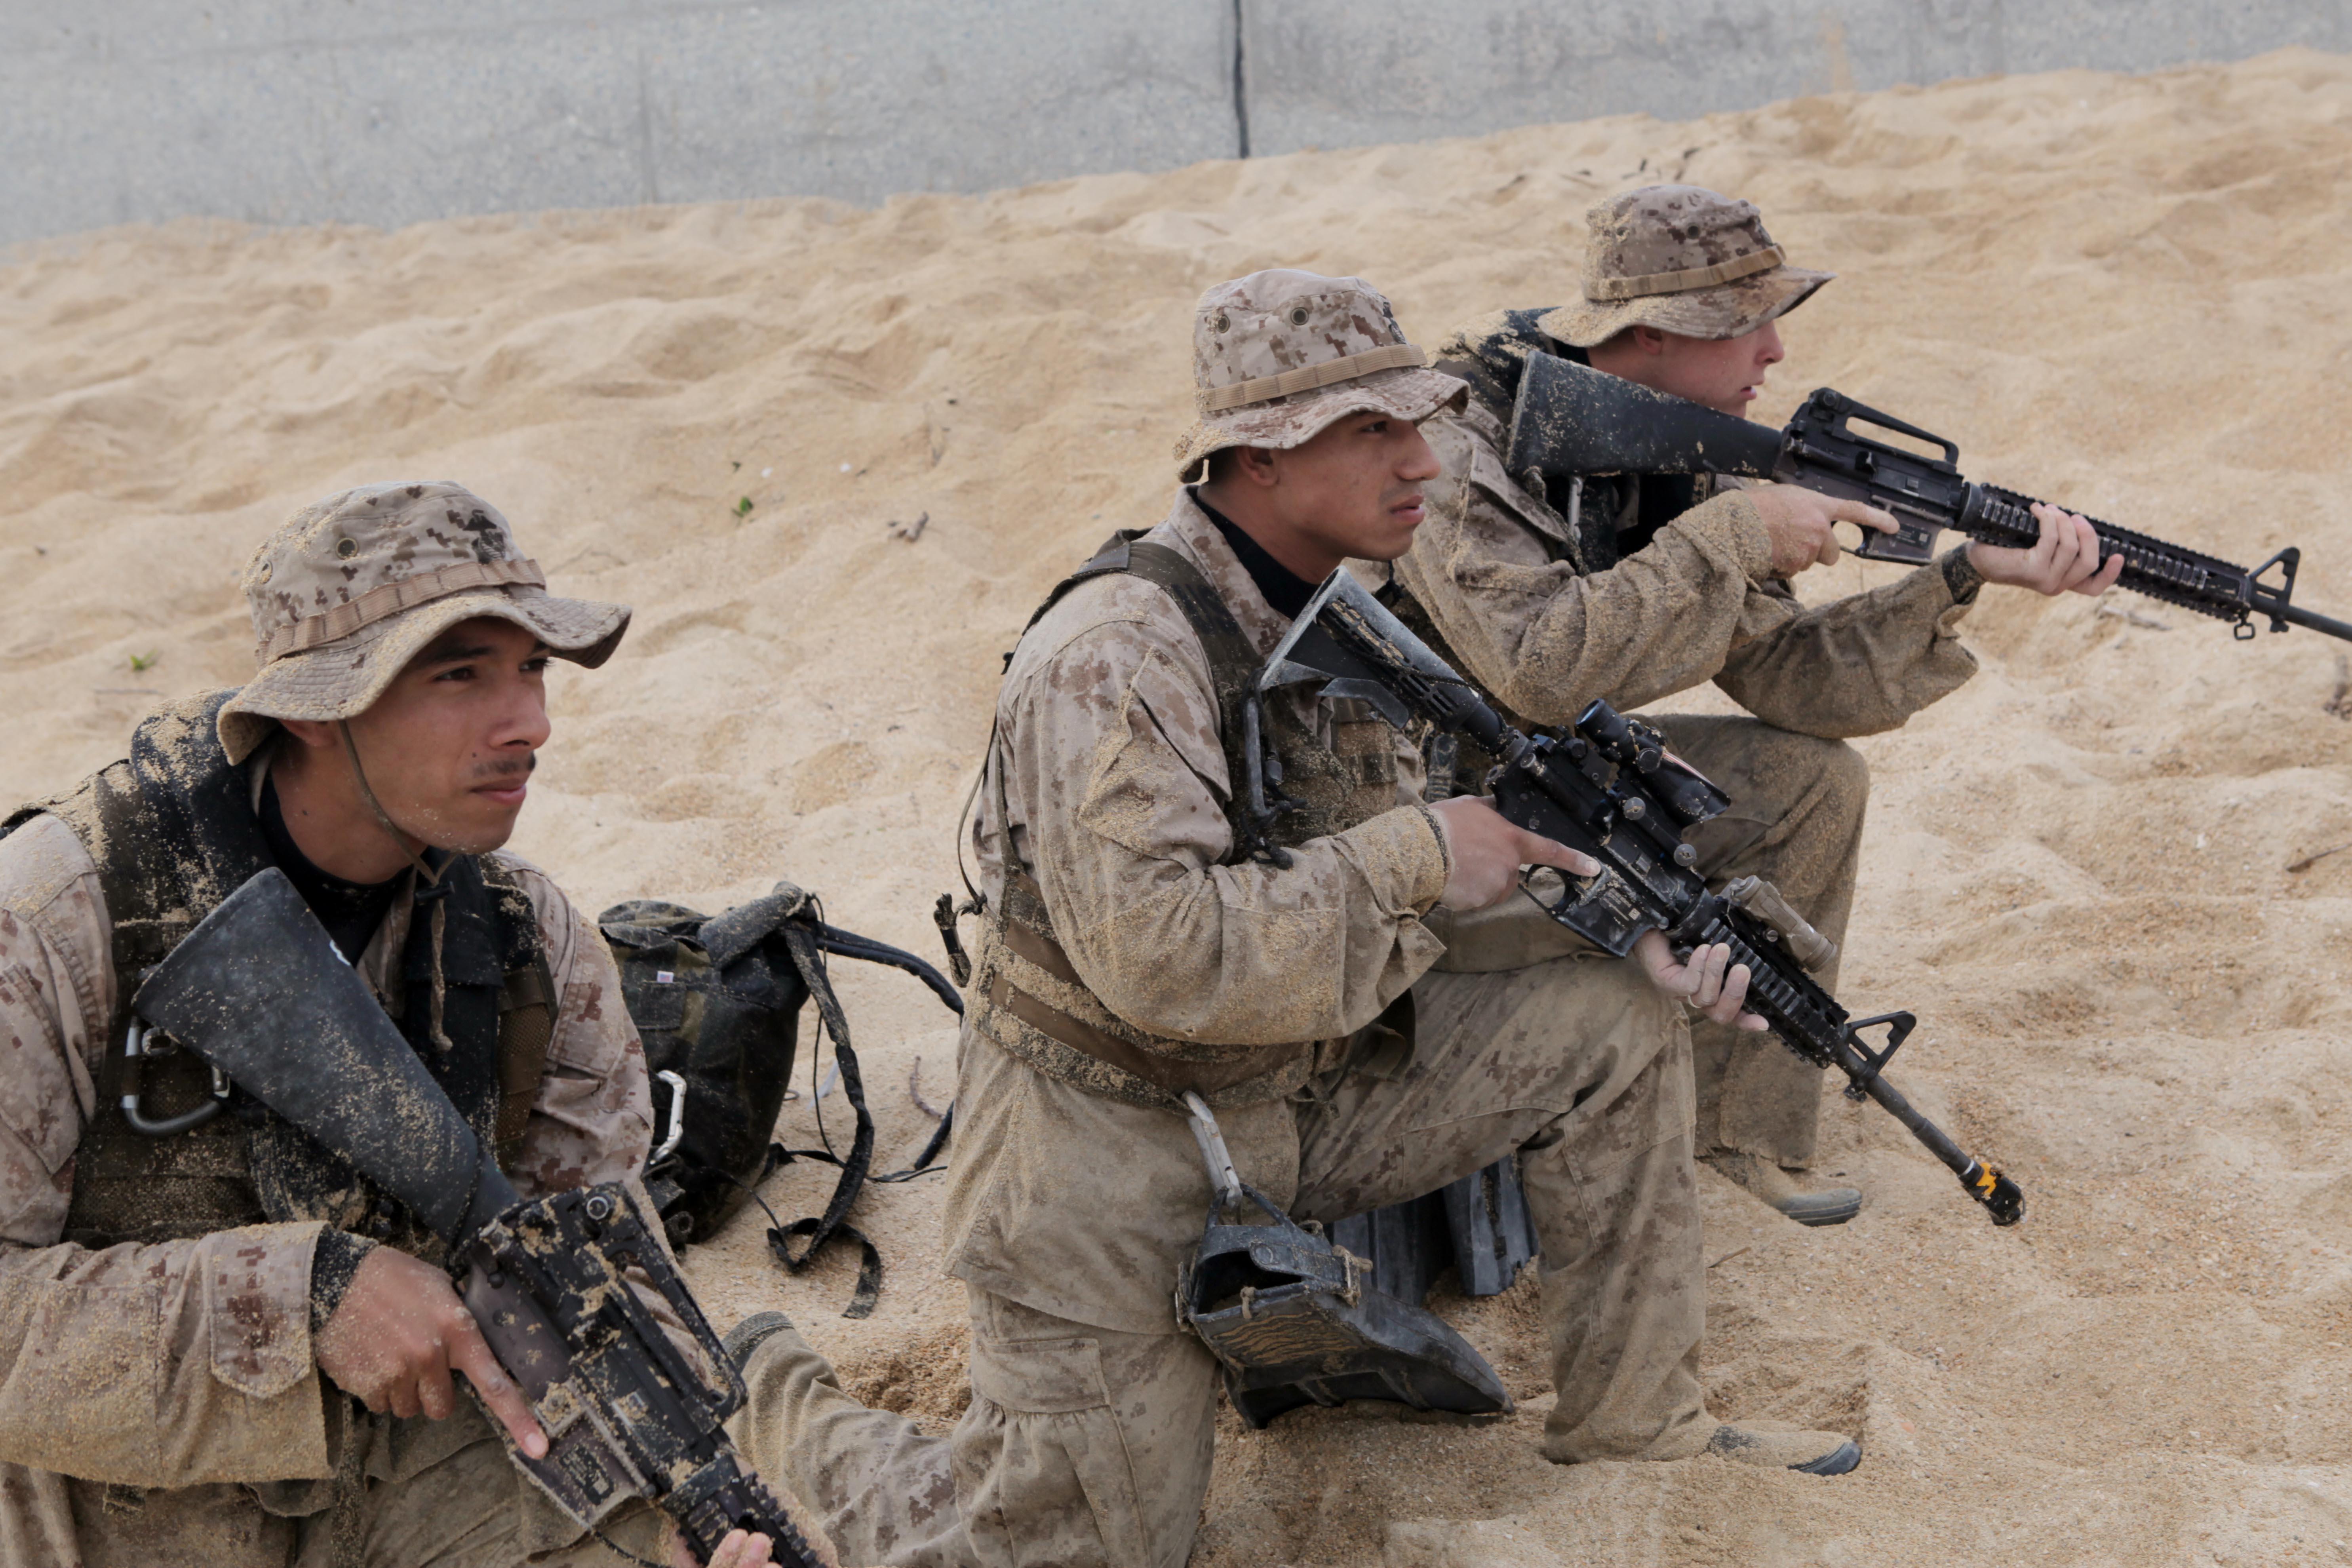 File:Defense.gov News Photo 111220-M-SE916-229 - Marine scout ...